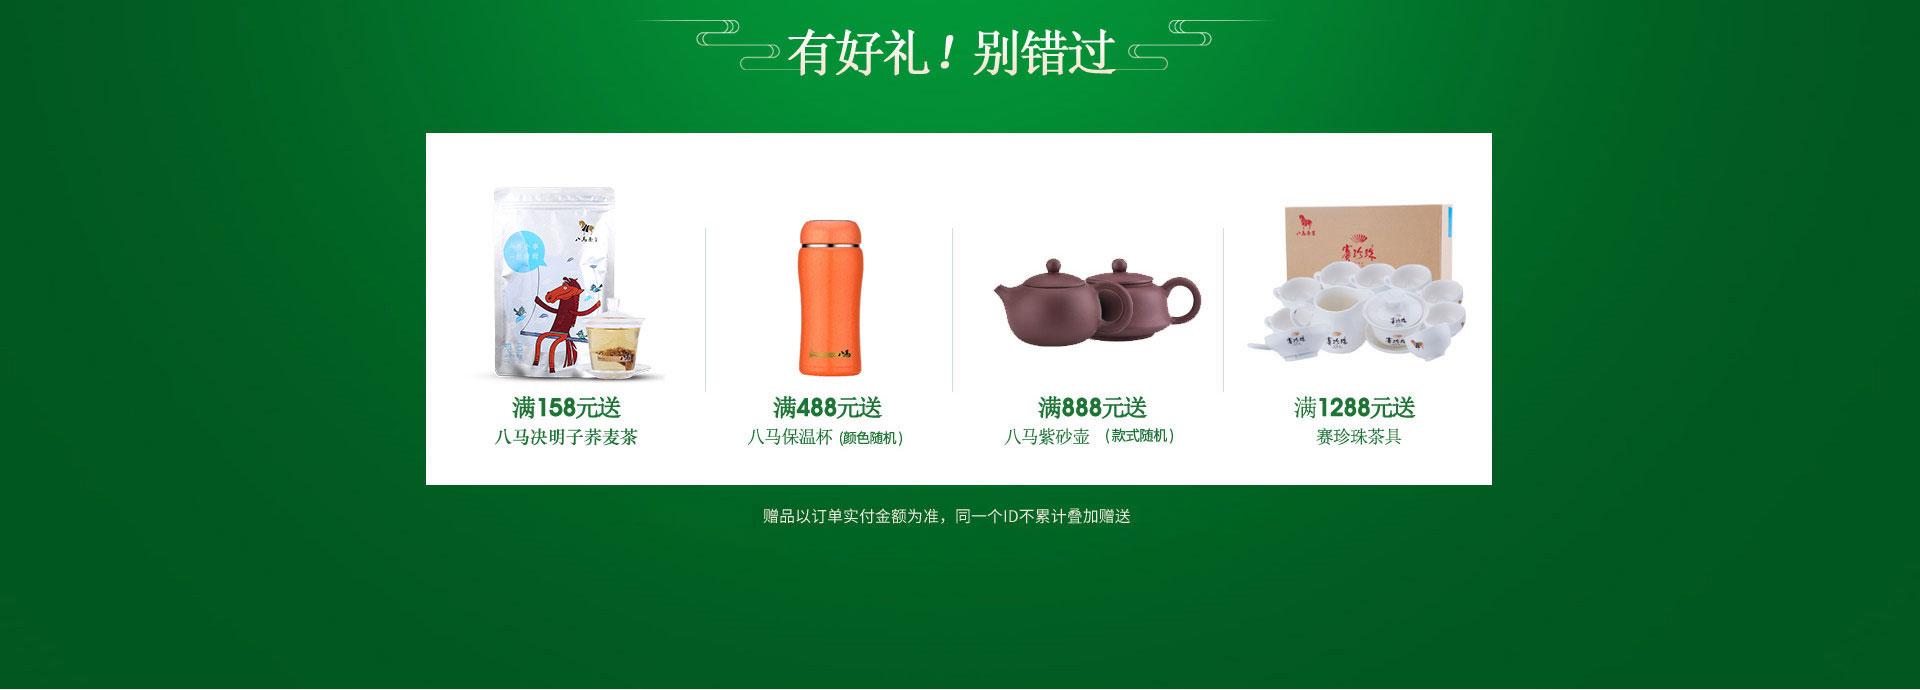 春茶2018_03